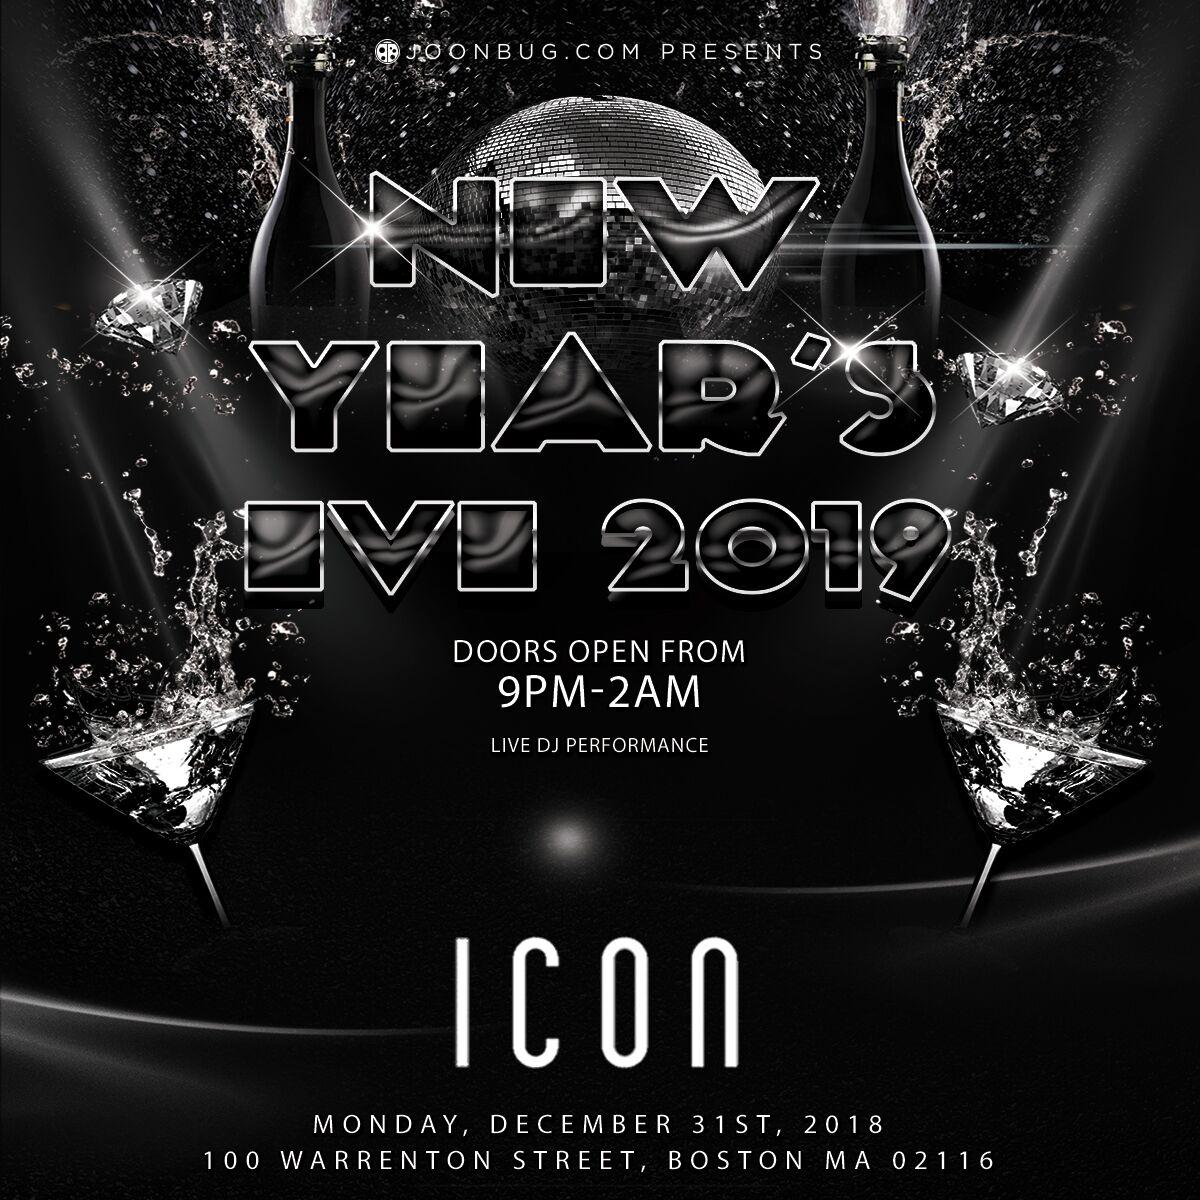 Boston Icon Nightclub VIP NYE Party   Buy Tickets Now